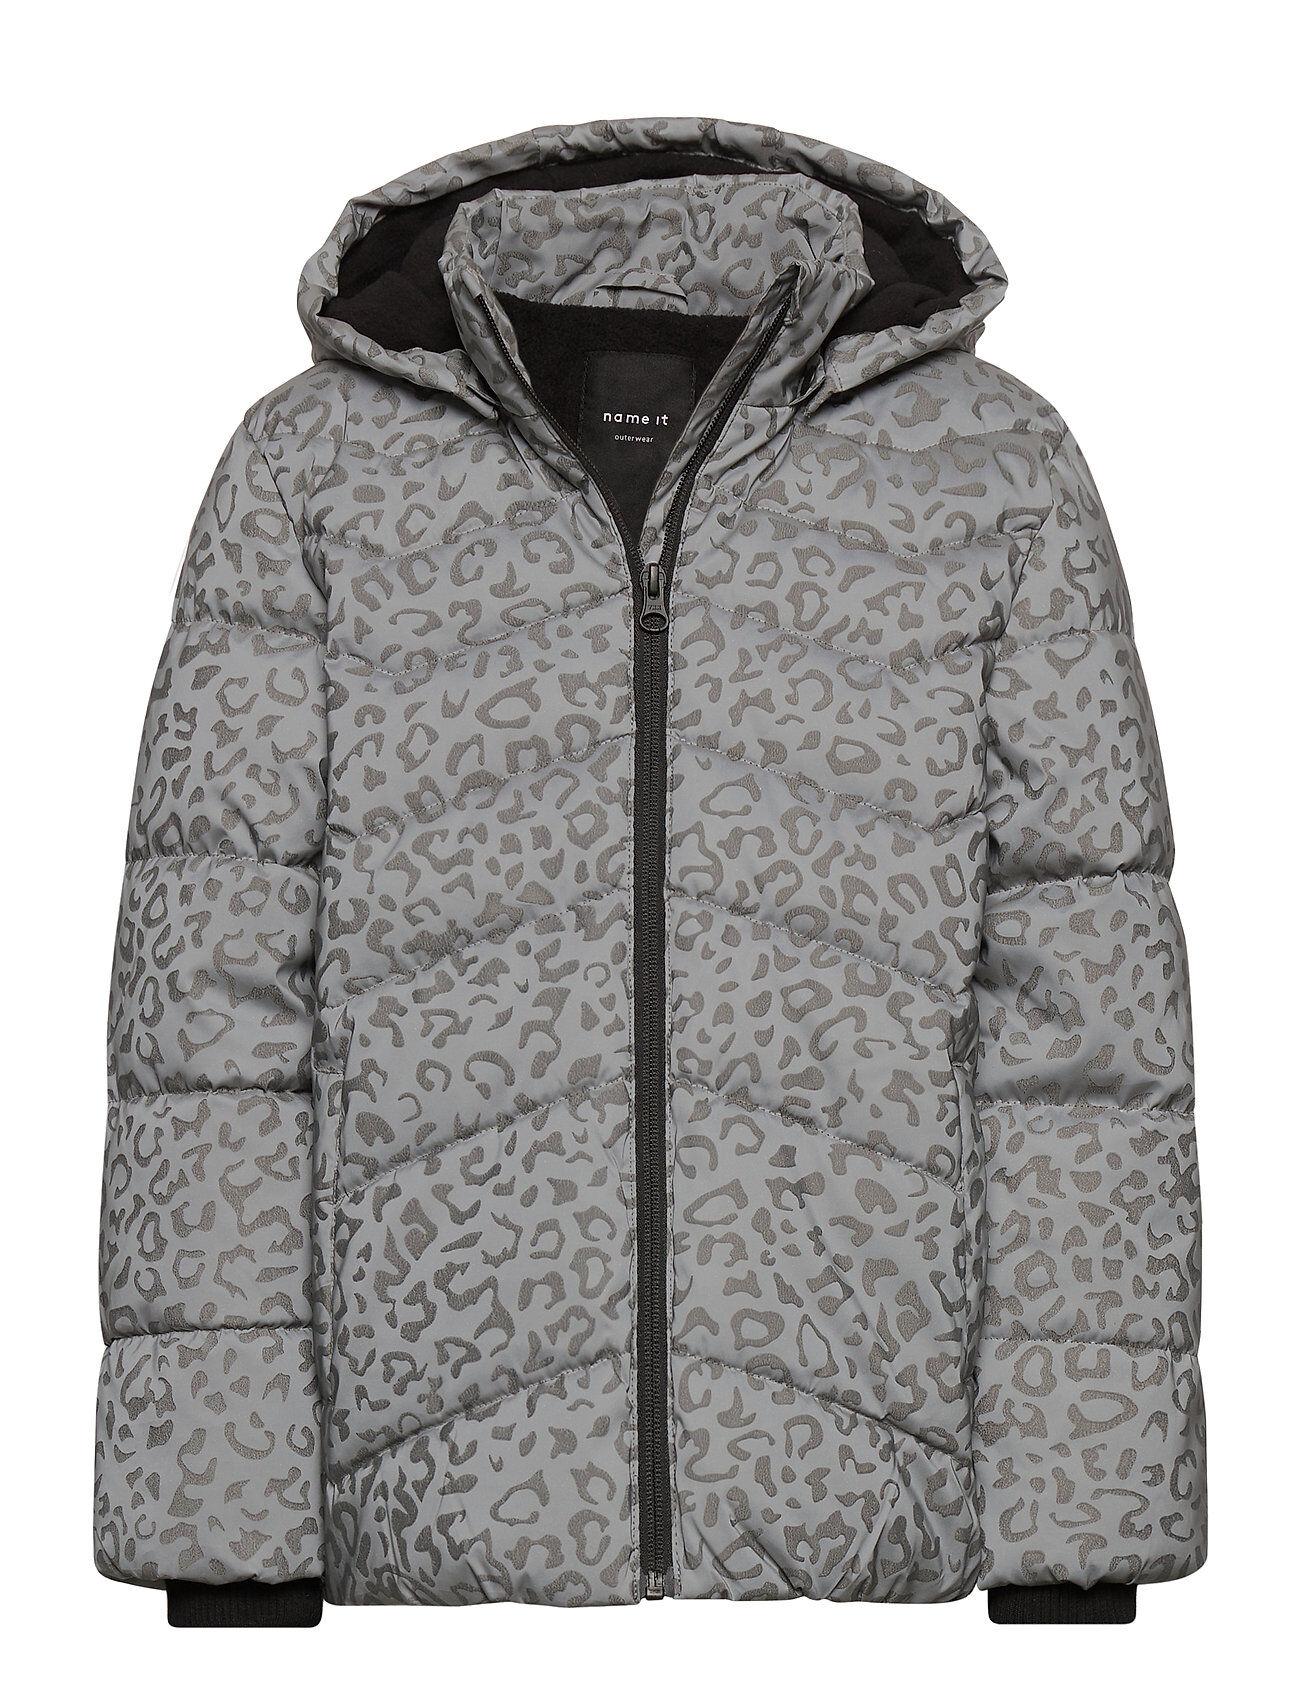 name it Nkfmatilda Reflective Jacket Toppatakki Harmaa Name It